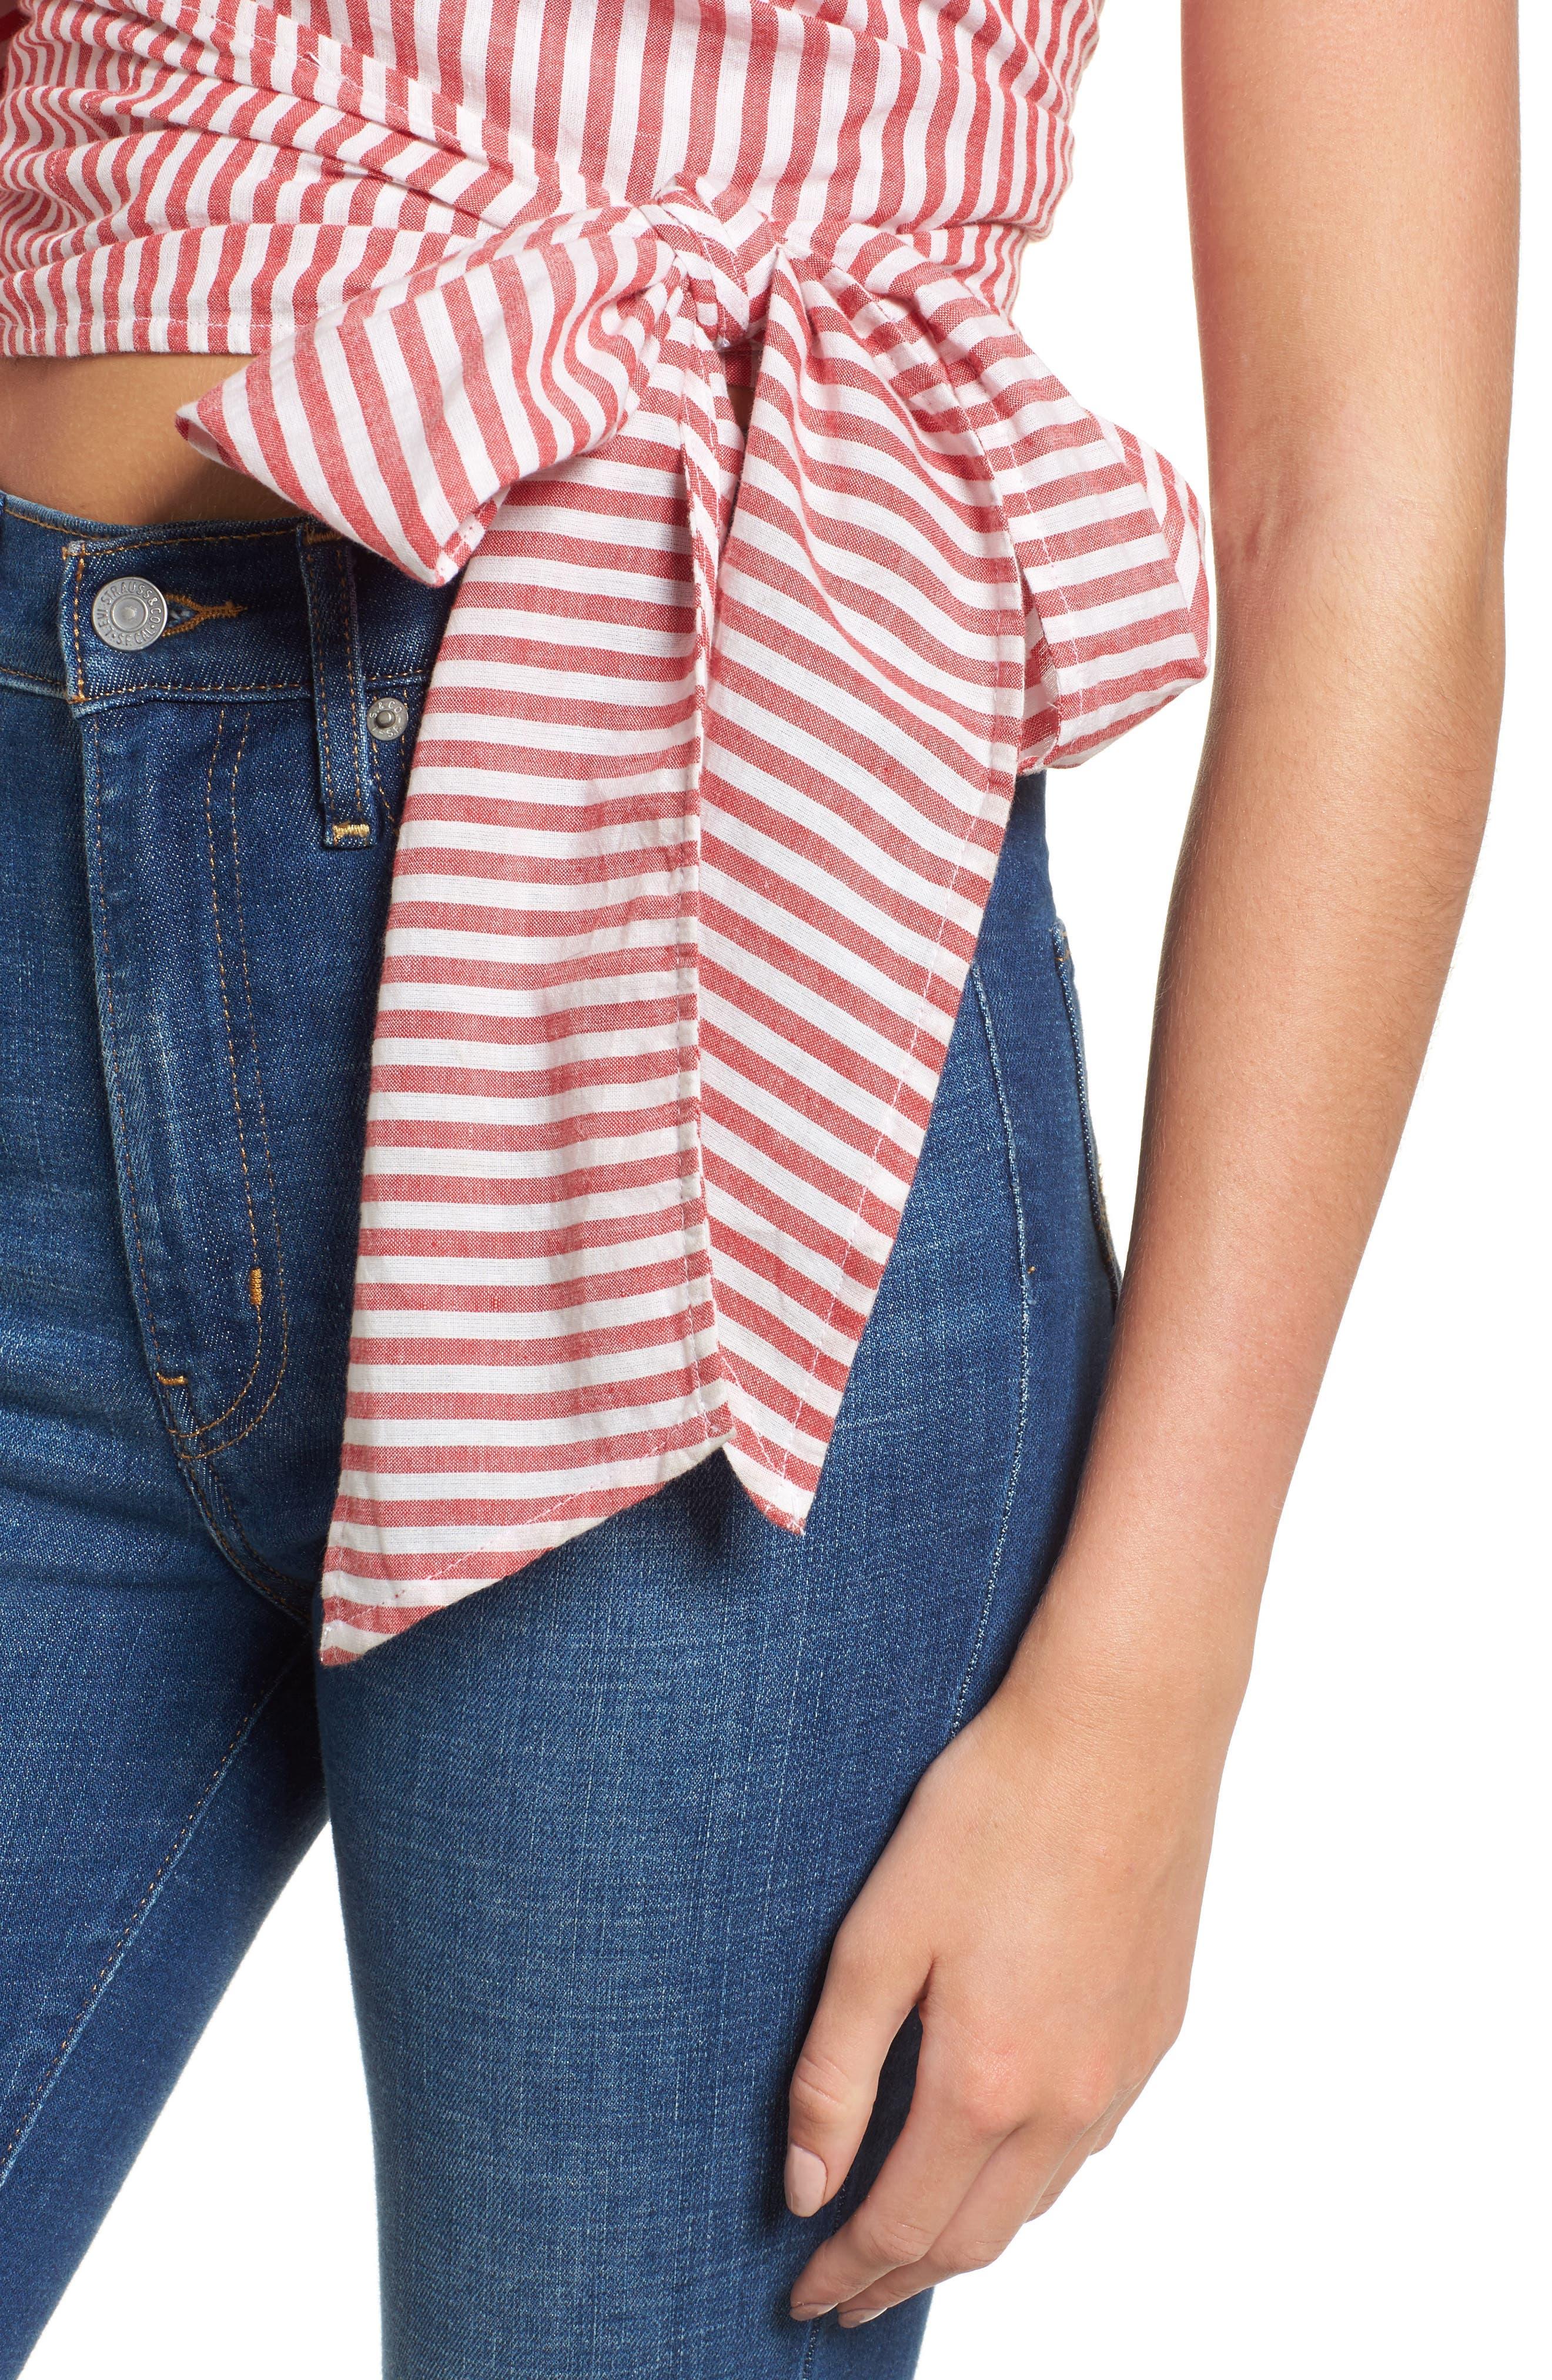 L'Academie Reckless One-Shoulder Wrap Blouse,                             Alternate thumbnail 4, color,                             Red/ White Stripe